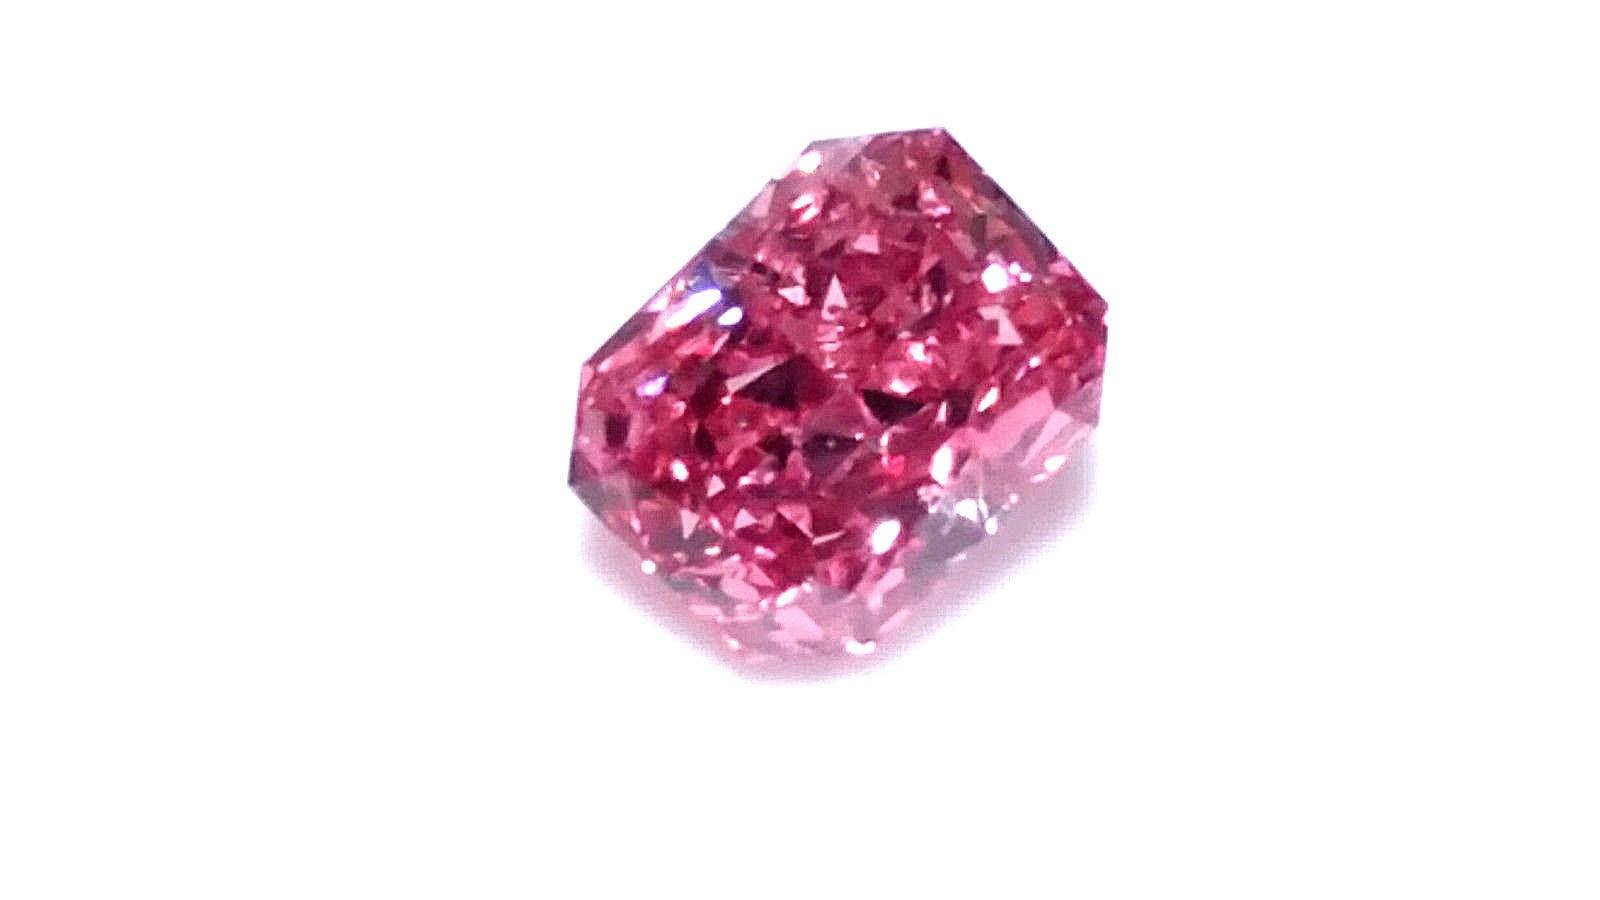 0.17ct Natural Loose Fancy Vivid Purplish Pink Color Diamond GIA SI1 Radiant